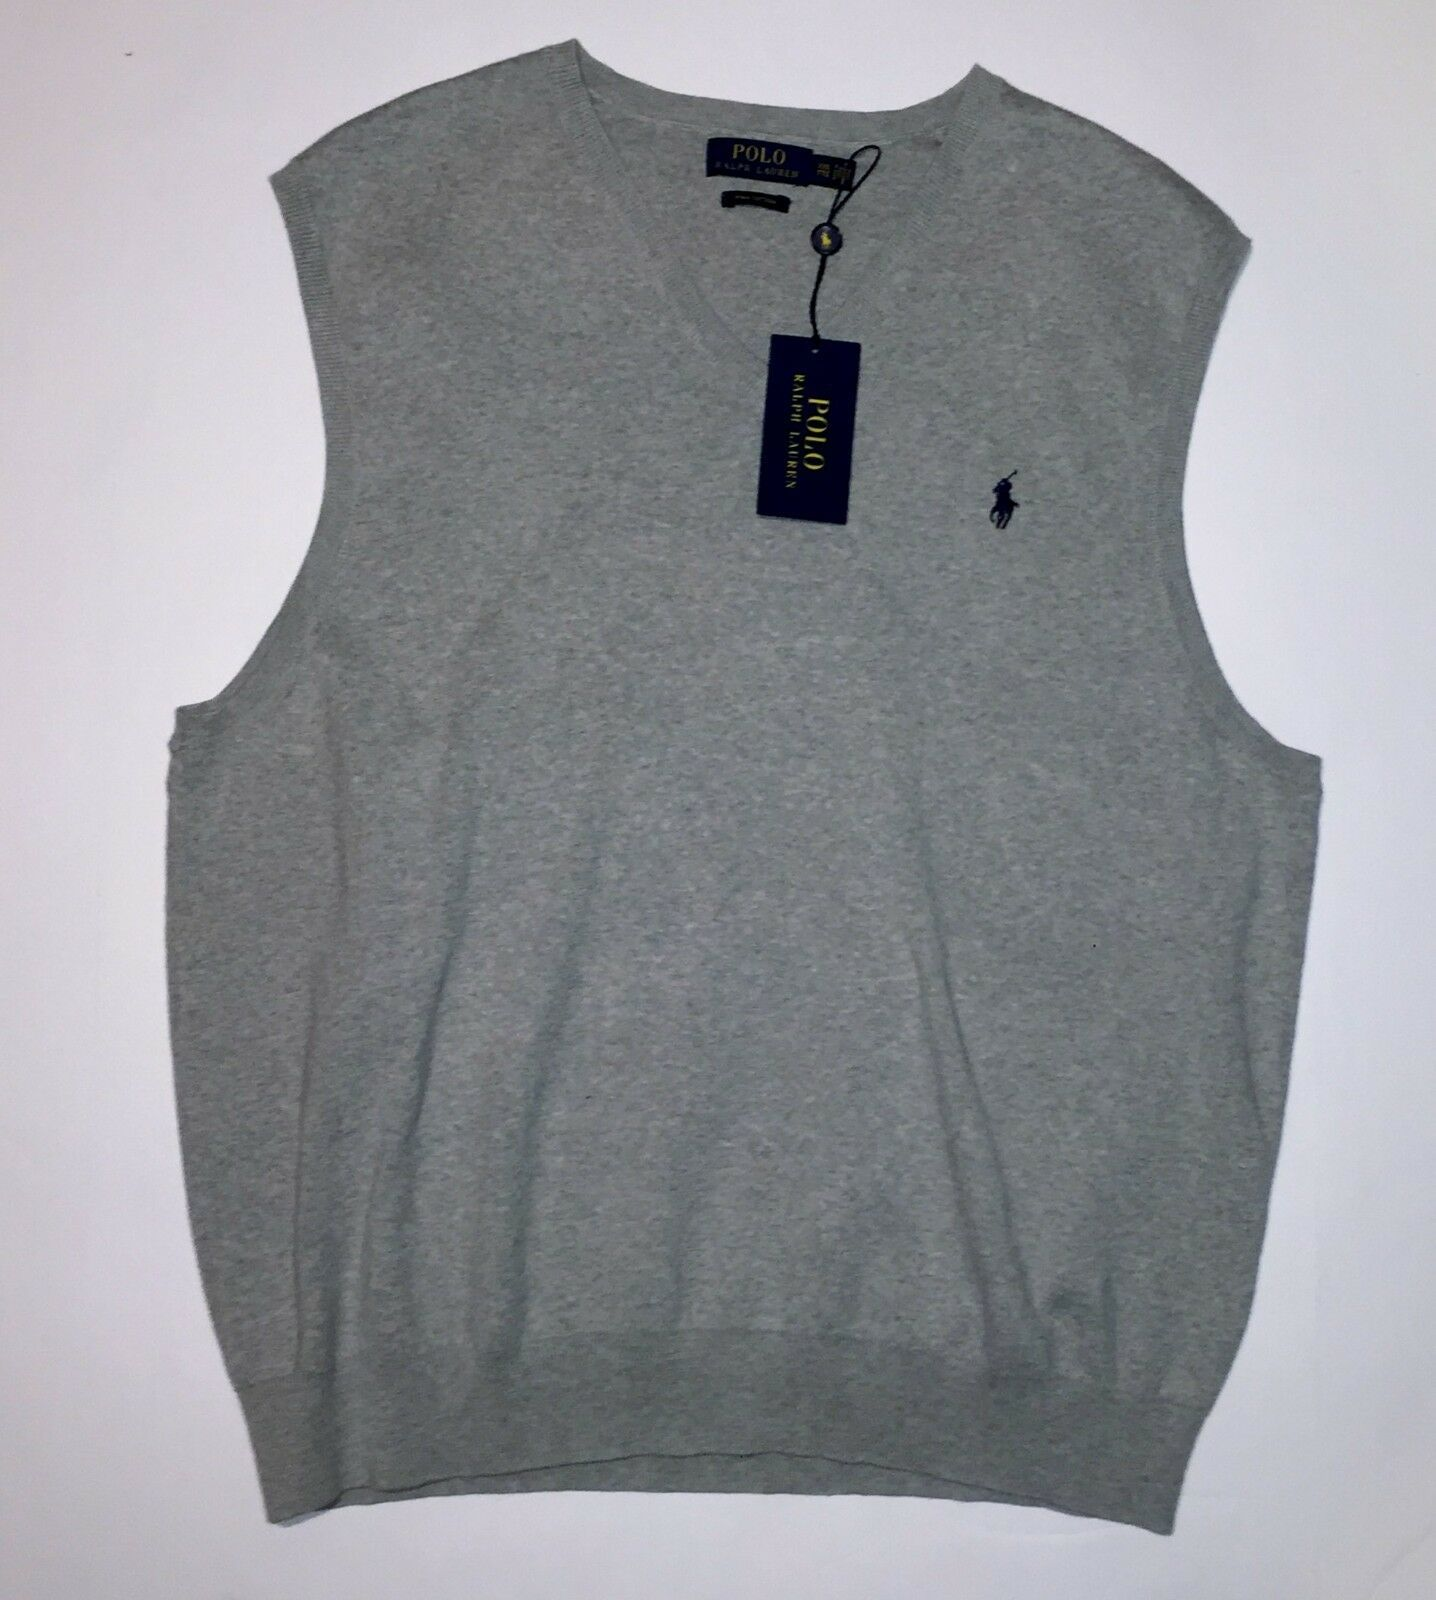 POLO RALPH LAUREN Men's Sweater Vest Stone Gray NWT L